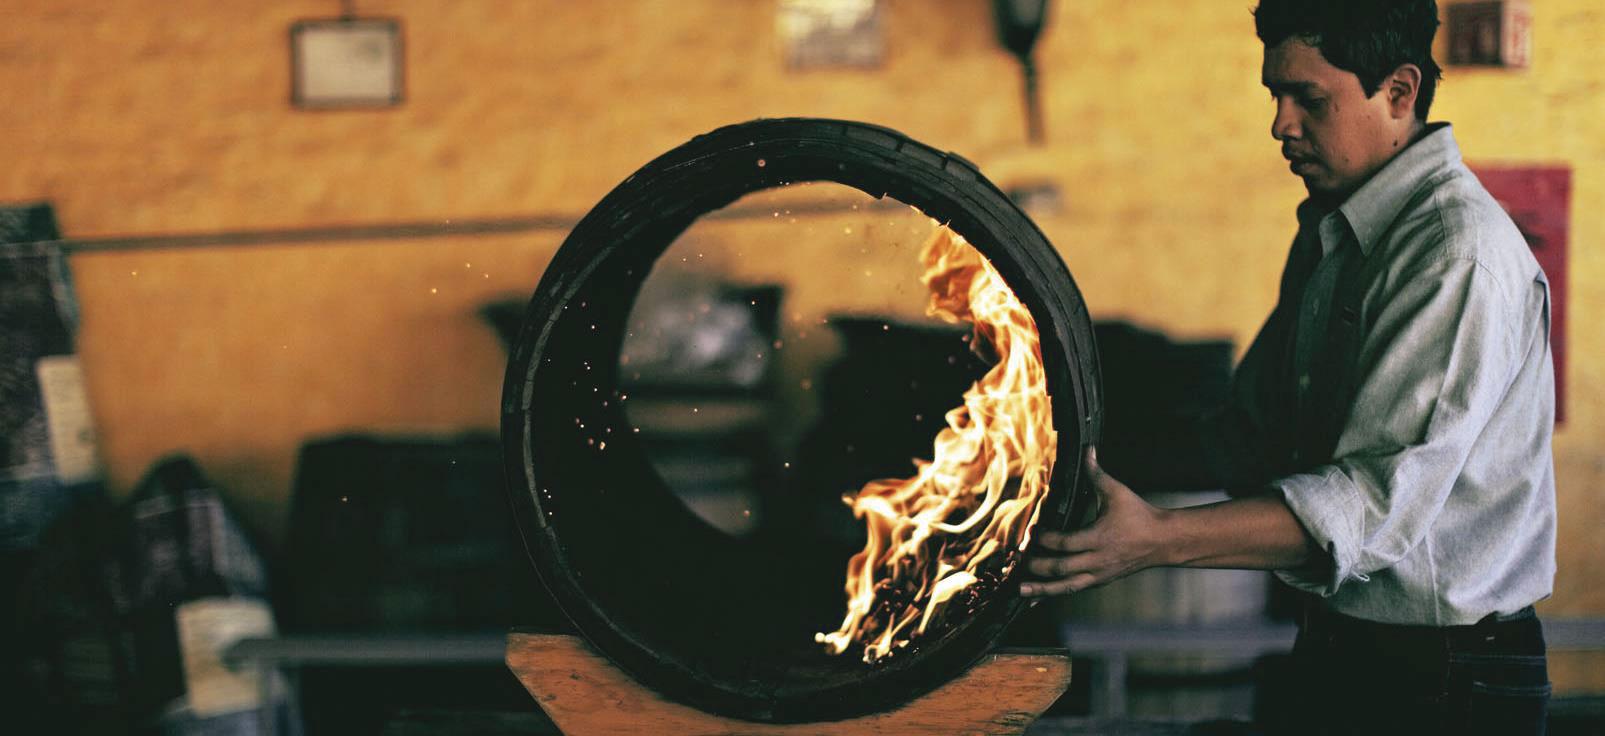 Barrel charring at Jose Cuervo.